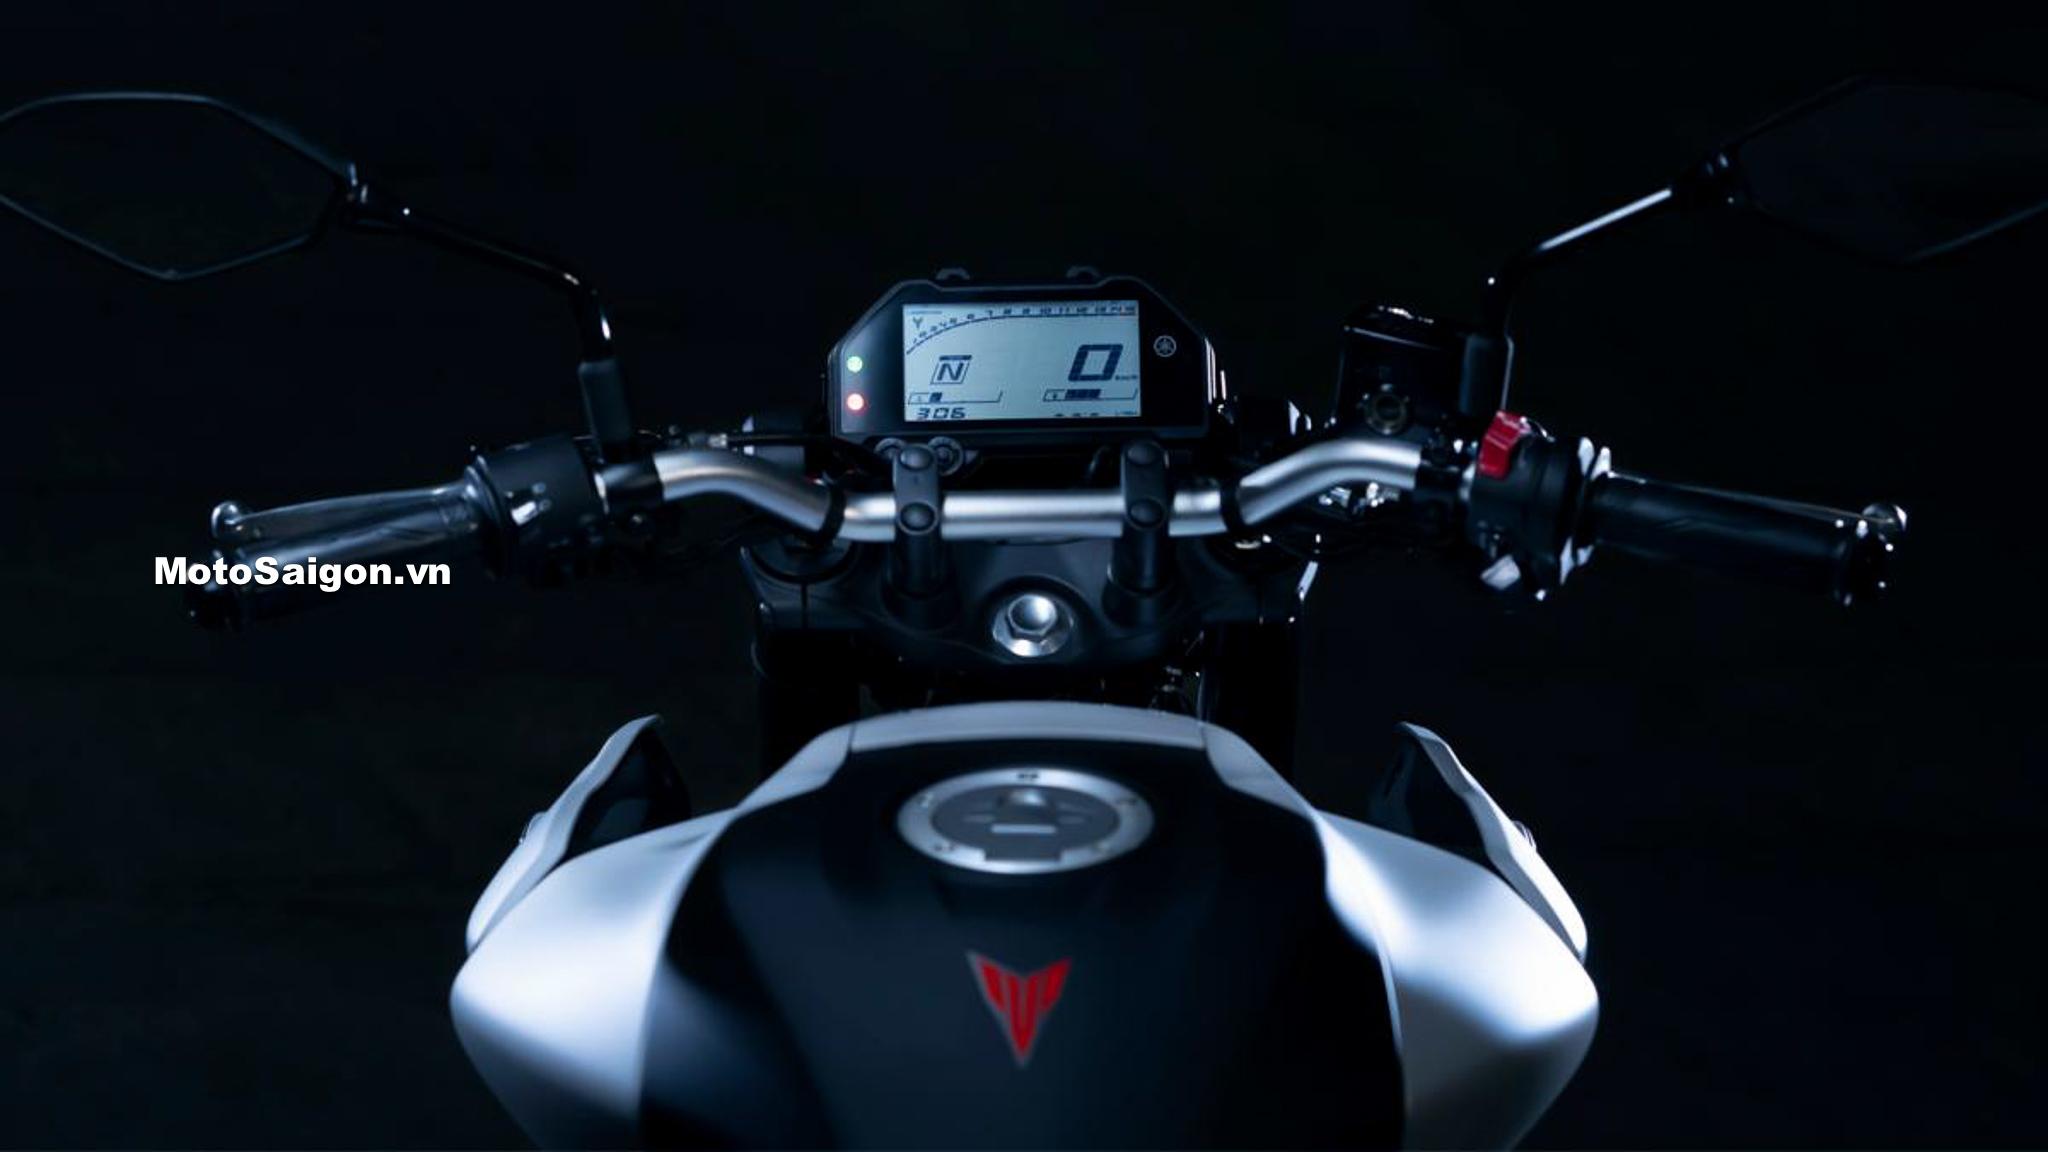 yamaha mt 03 abs 2020 danh gia xe motosaigon 16